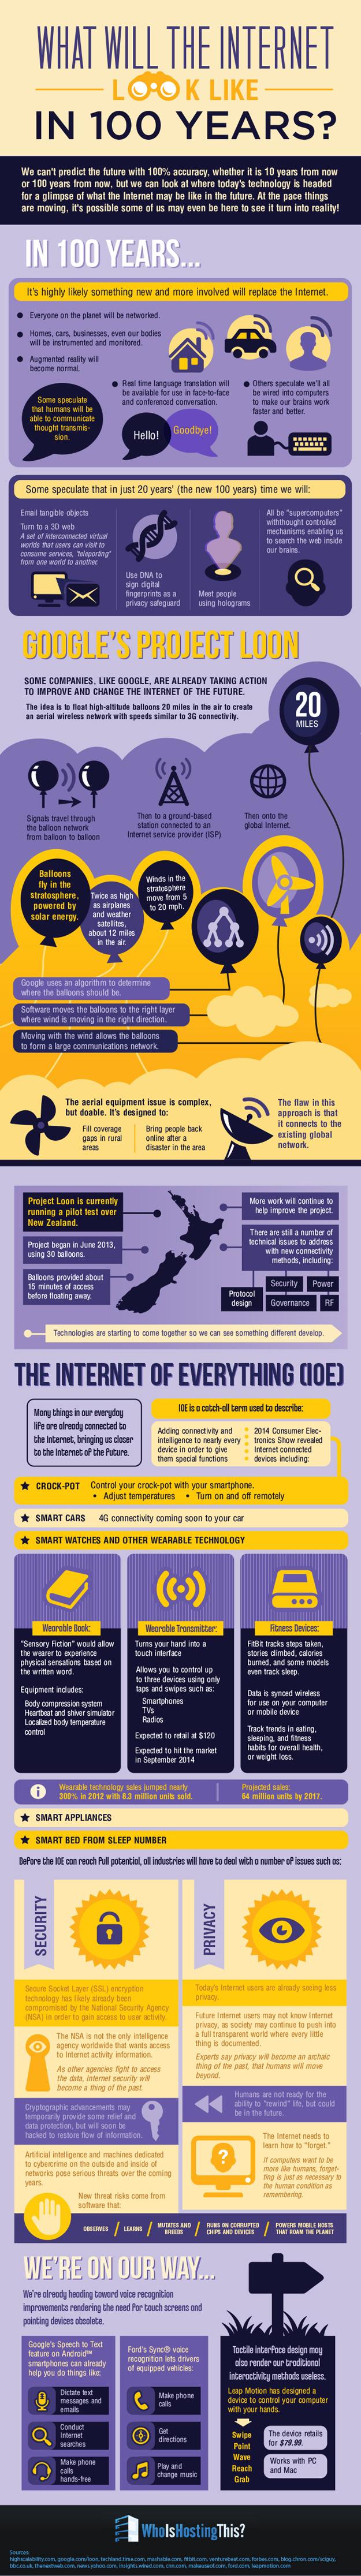 internet-100-years